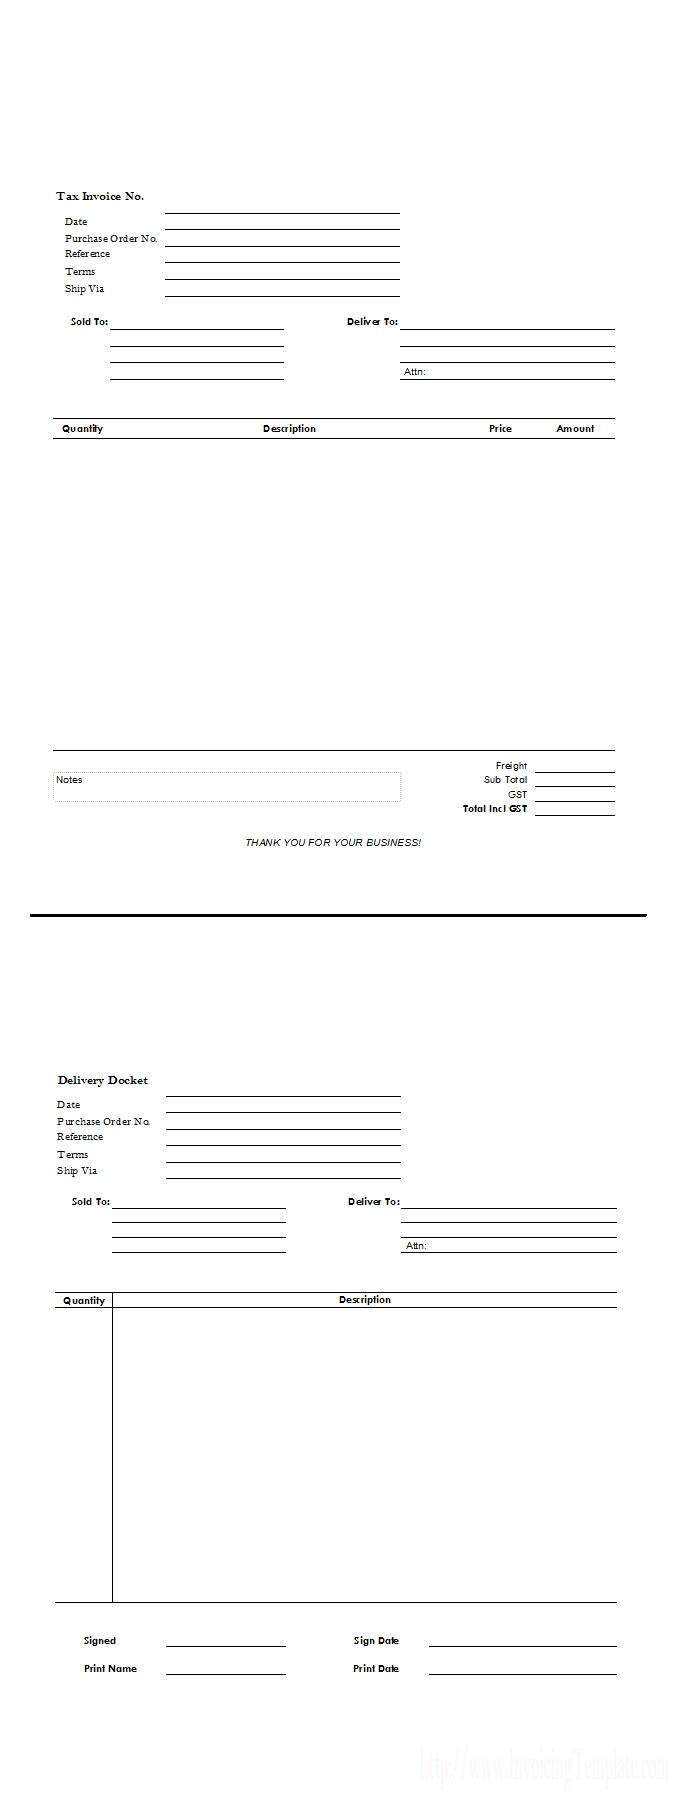 Contoh Packing List Dan Invoice * Invoice Template Ideas